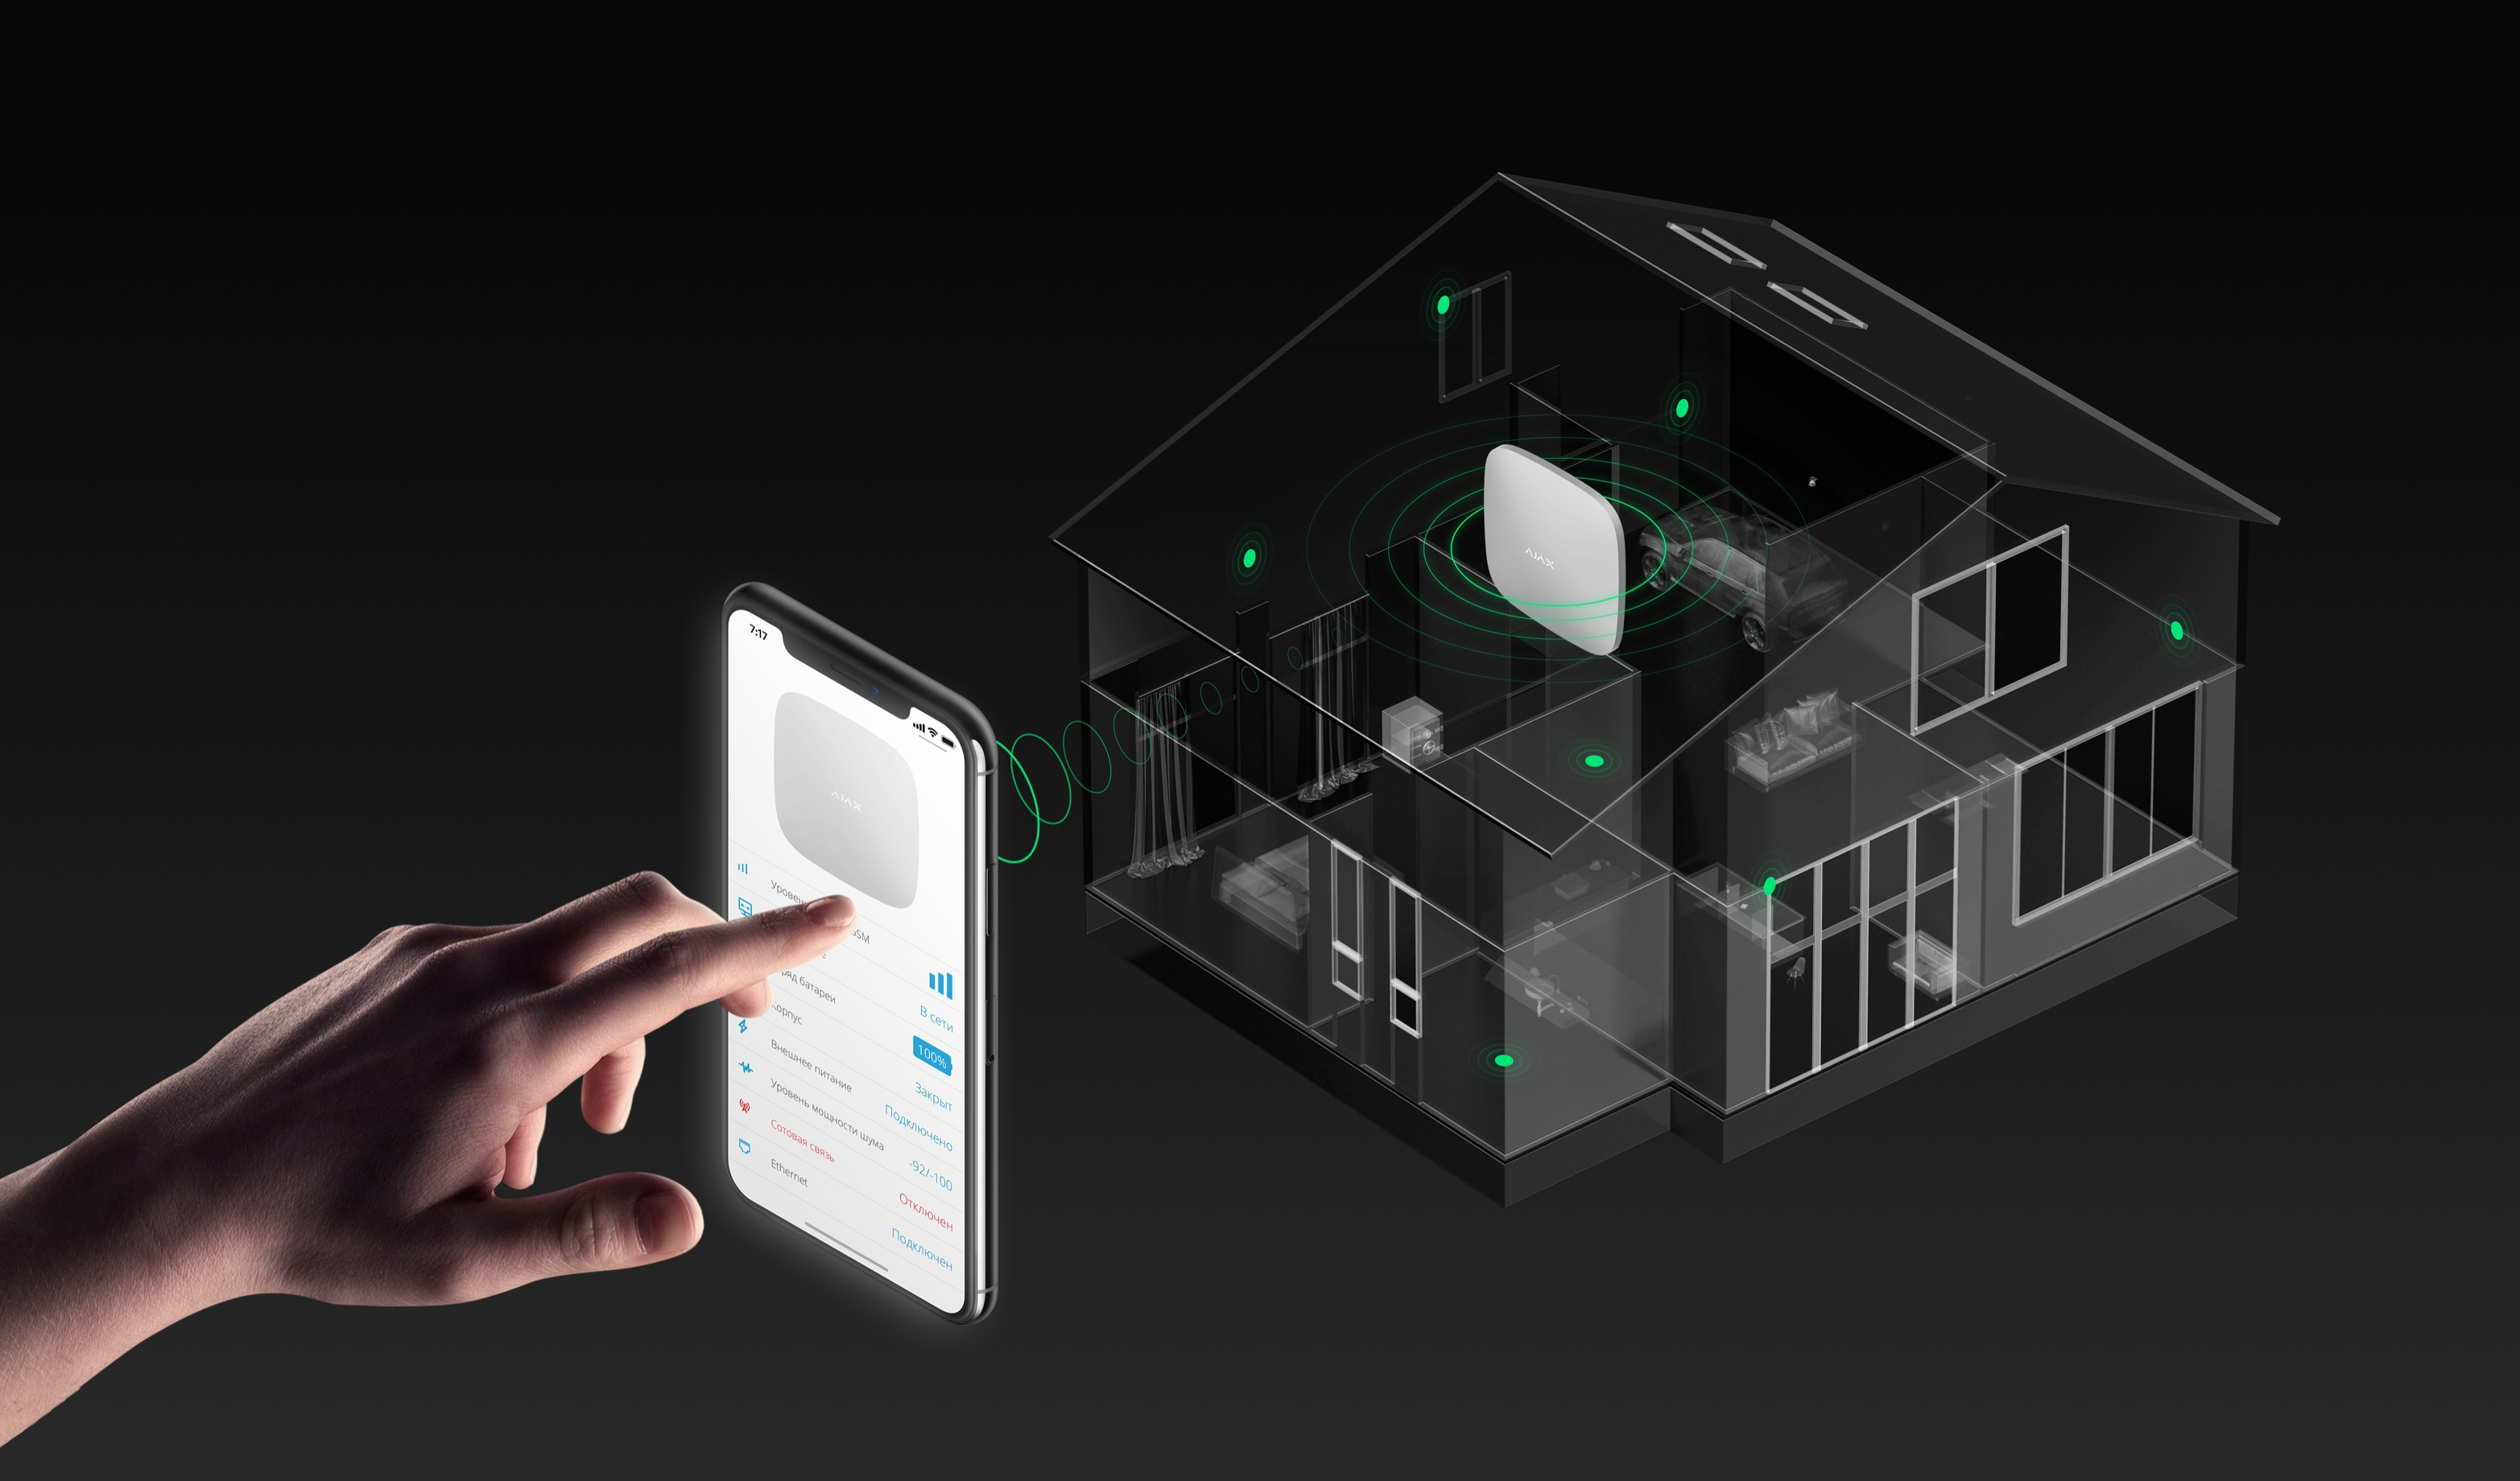 Ajax wireless smart alarm south africa